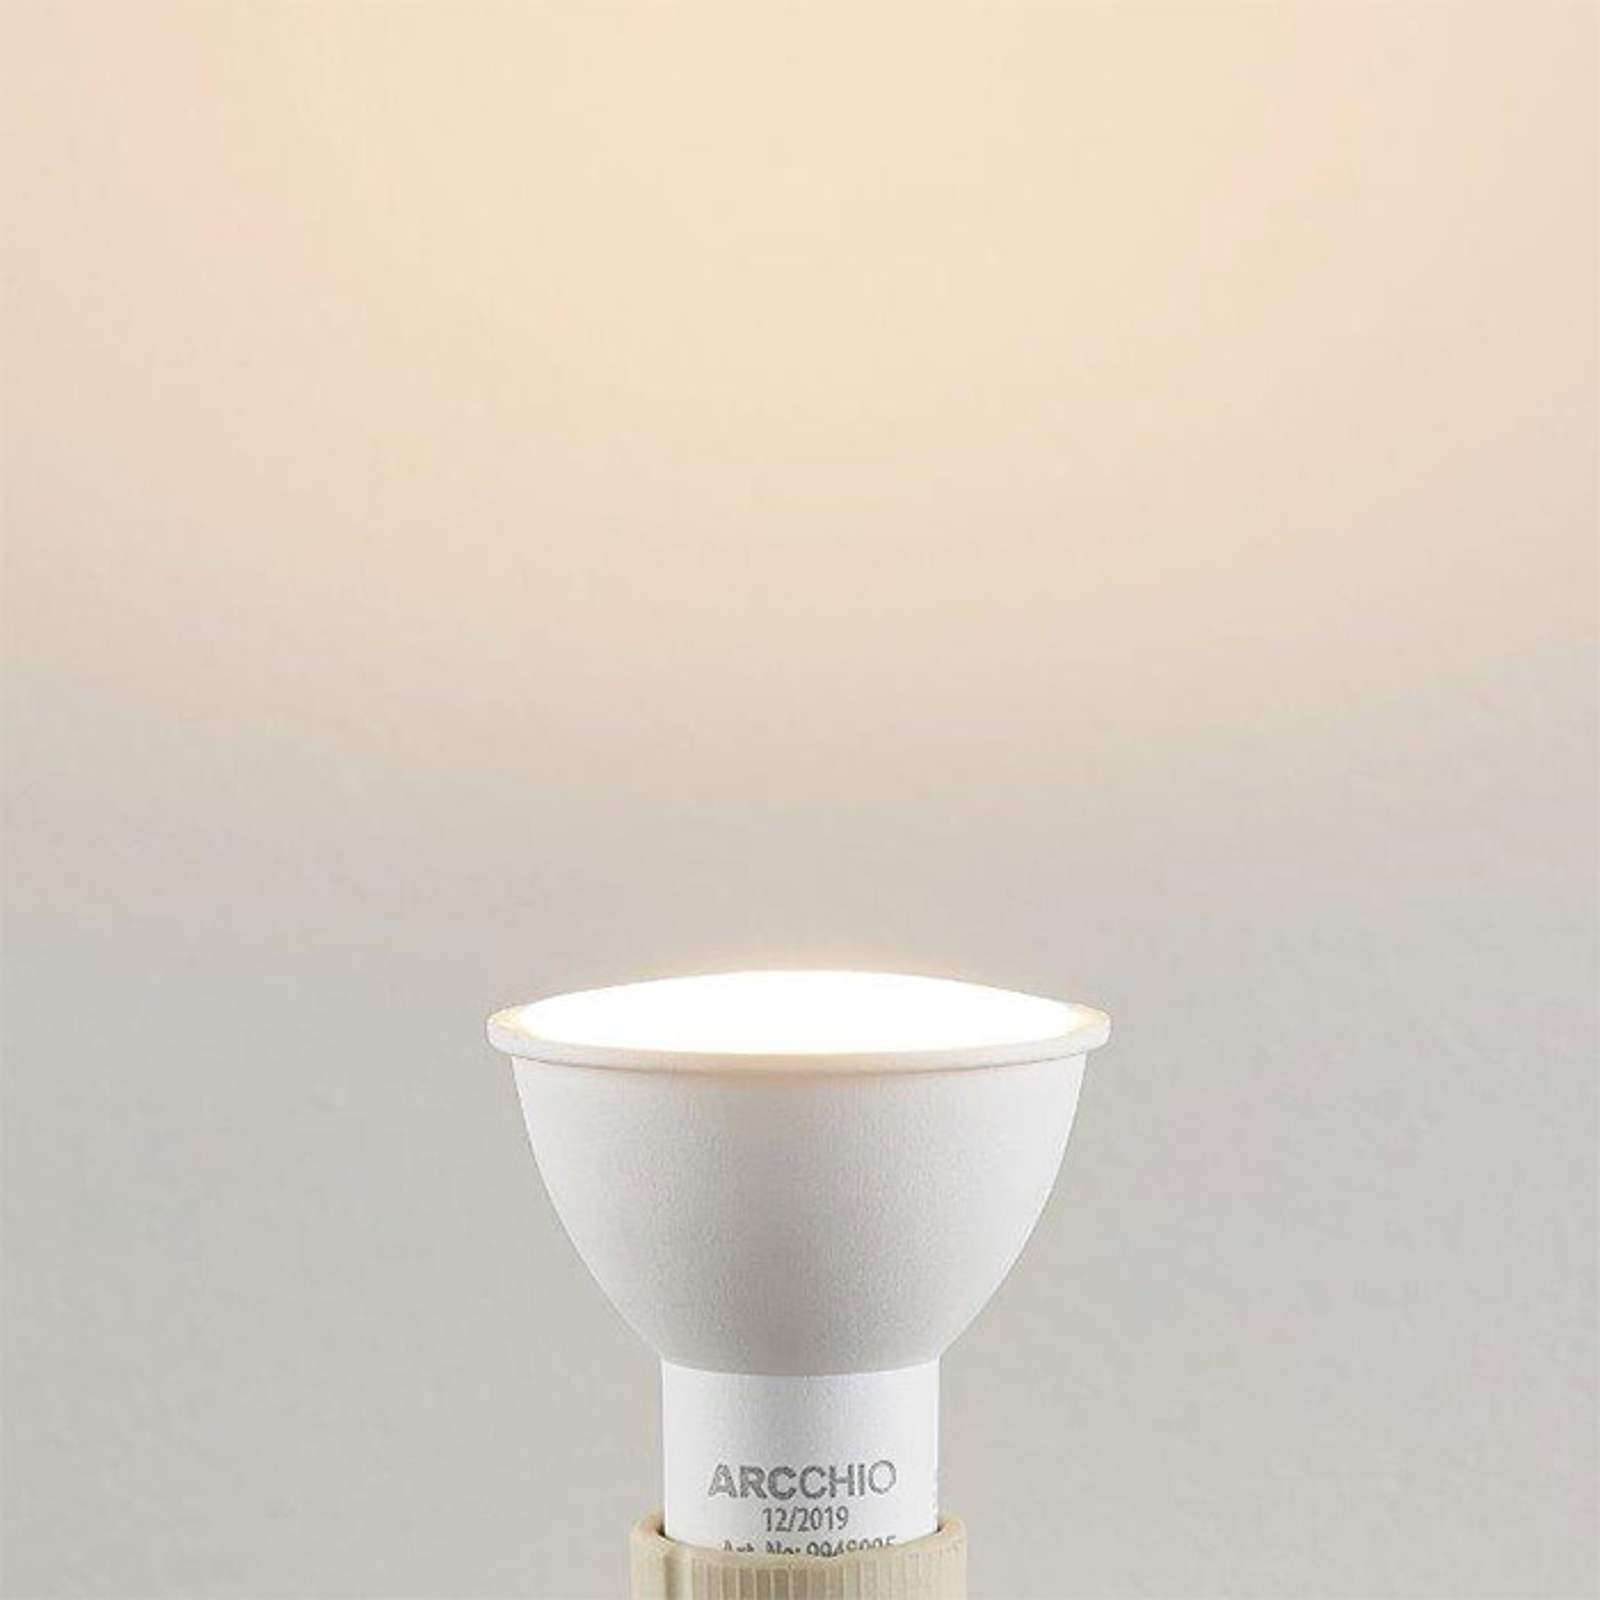 LED-heijastinlamppu GU10 7W 3000K 120°